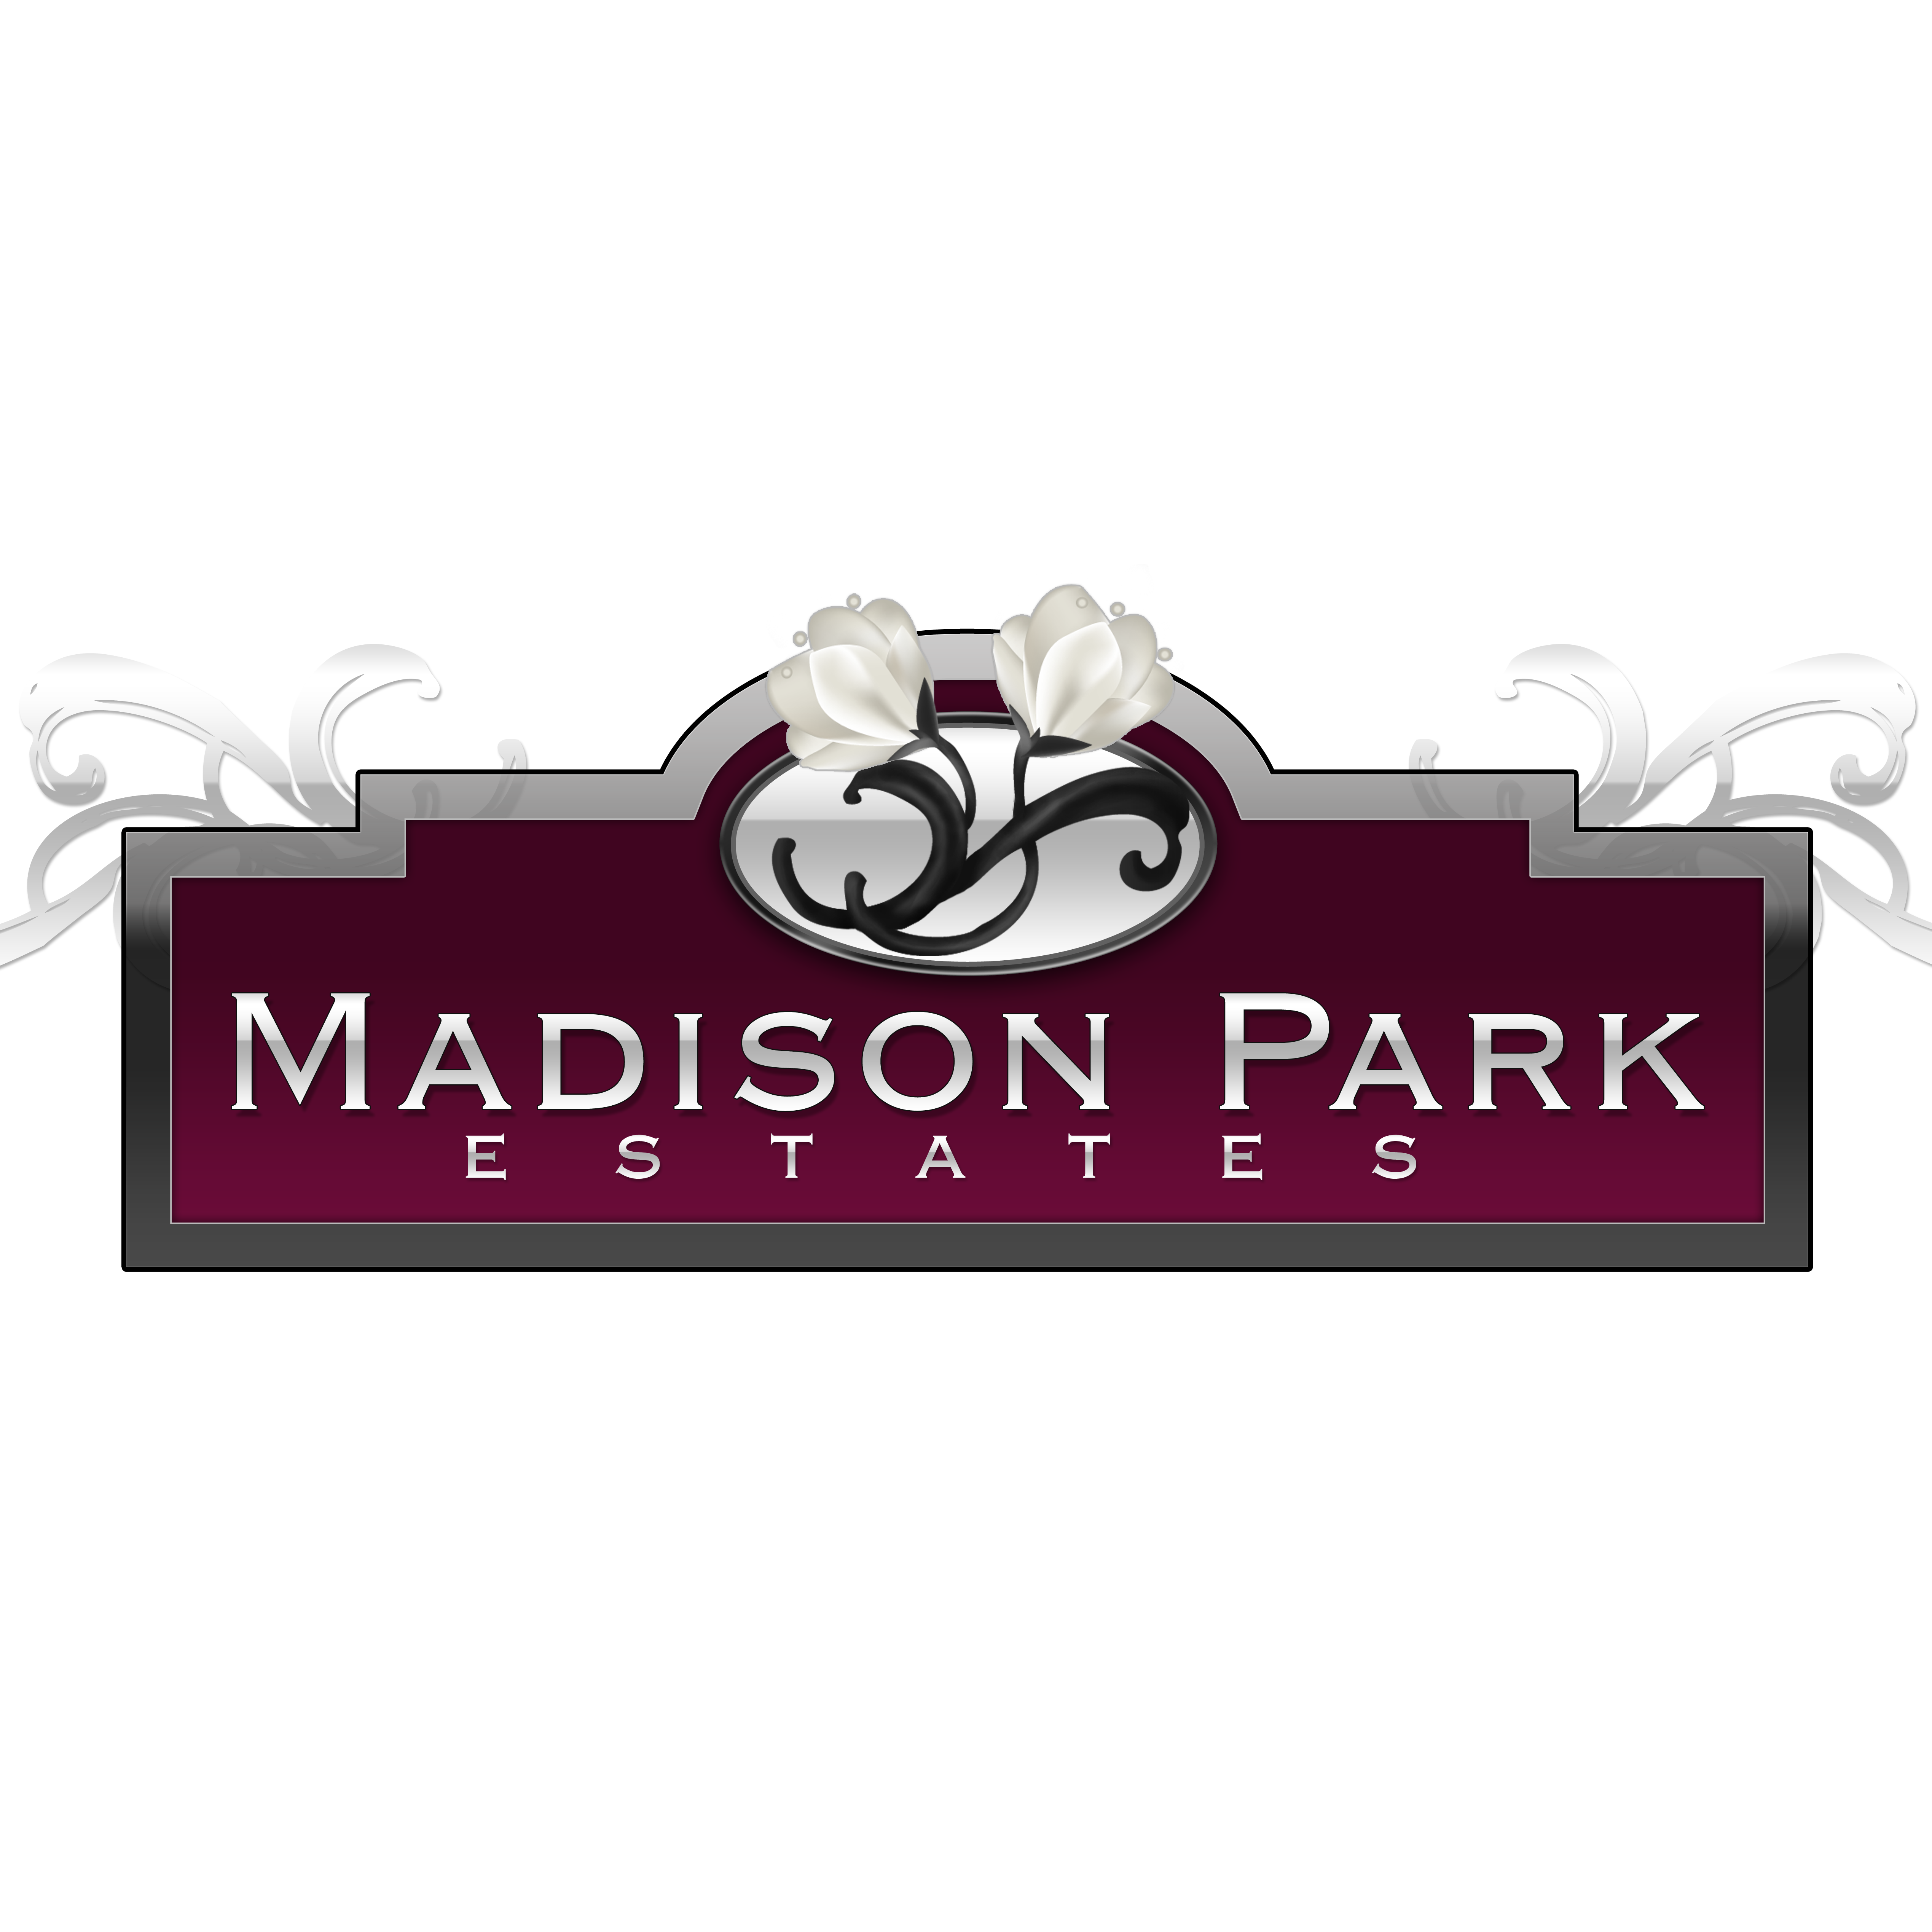 Madison Park by Viking Homes image 4